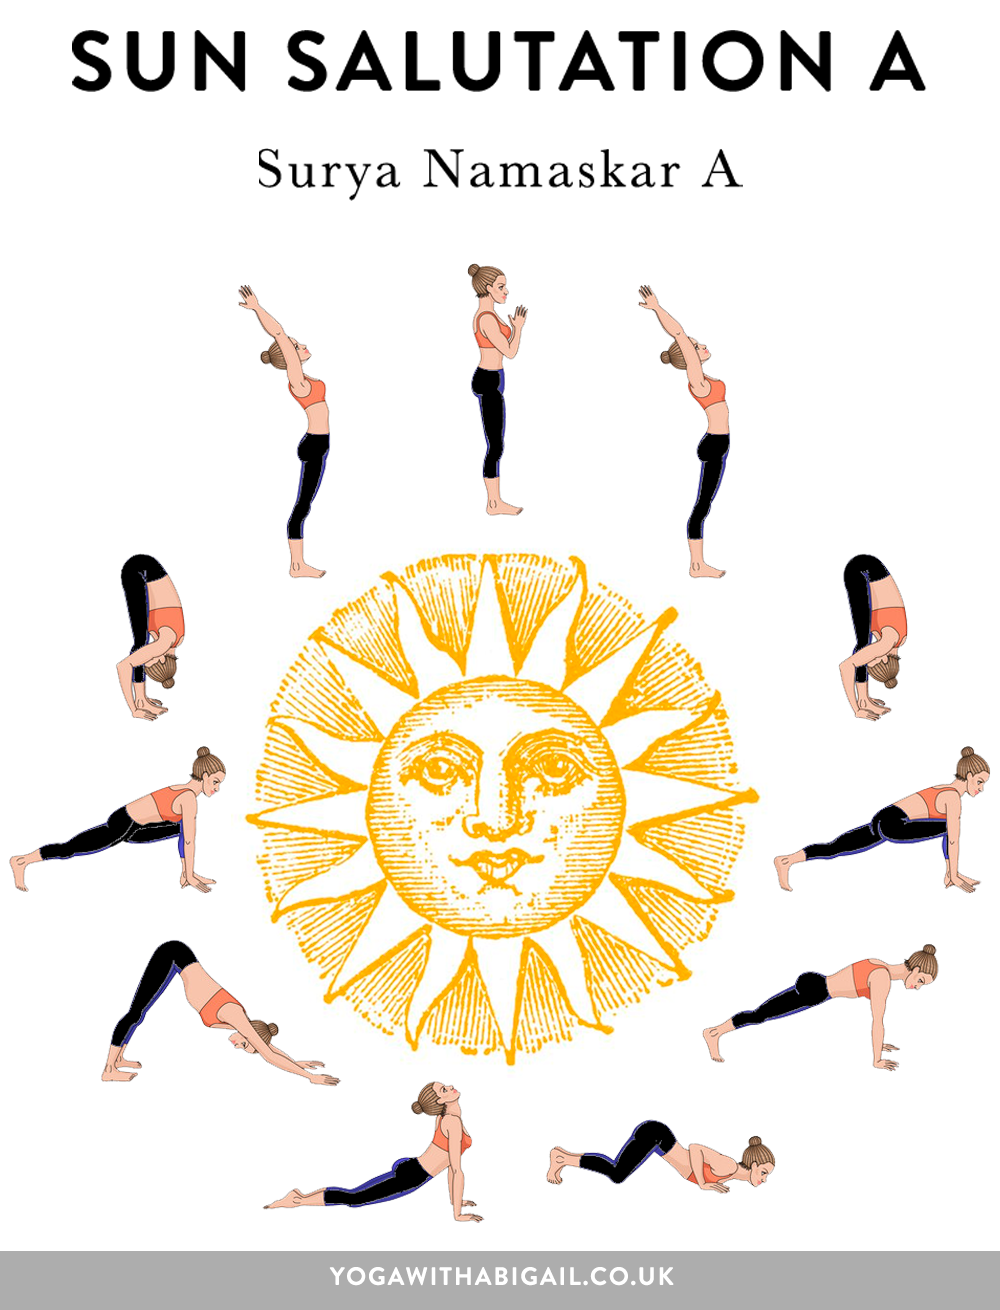 Sun Salutation A   How to for Beginners   Sun salutation, Surya ...